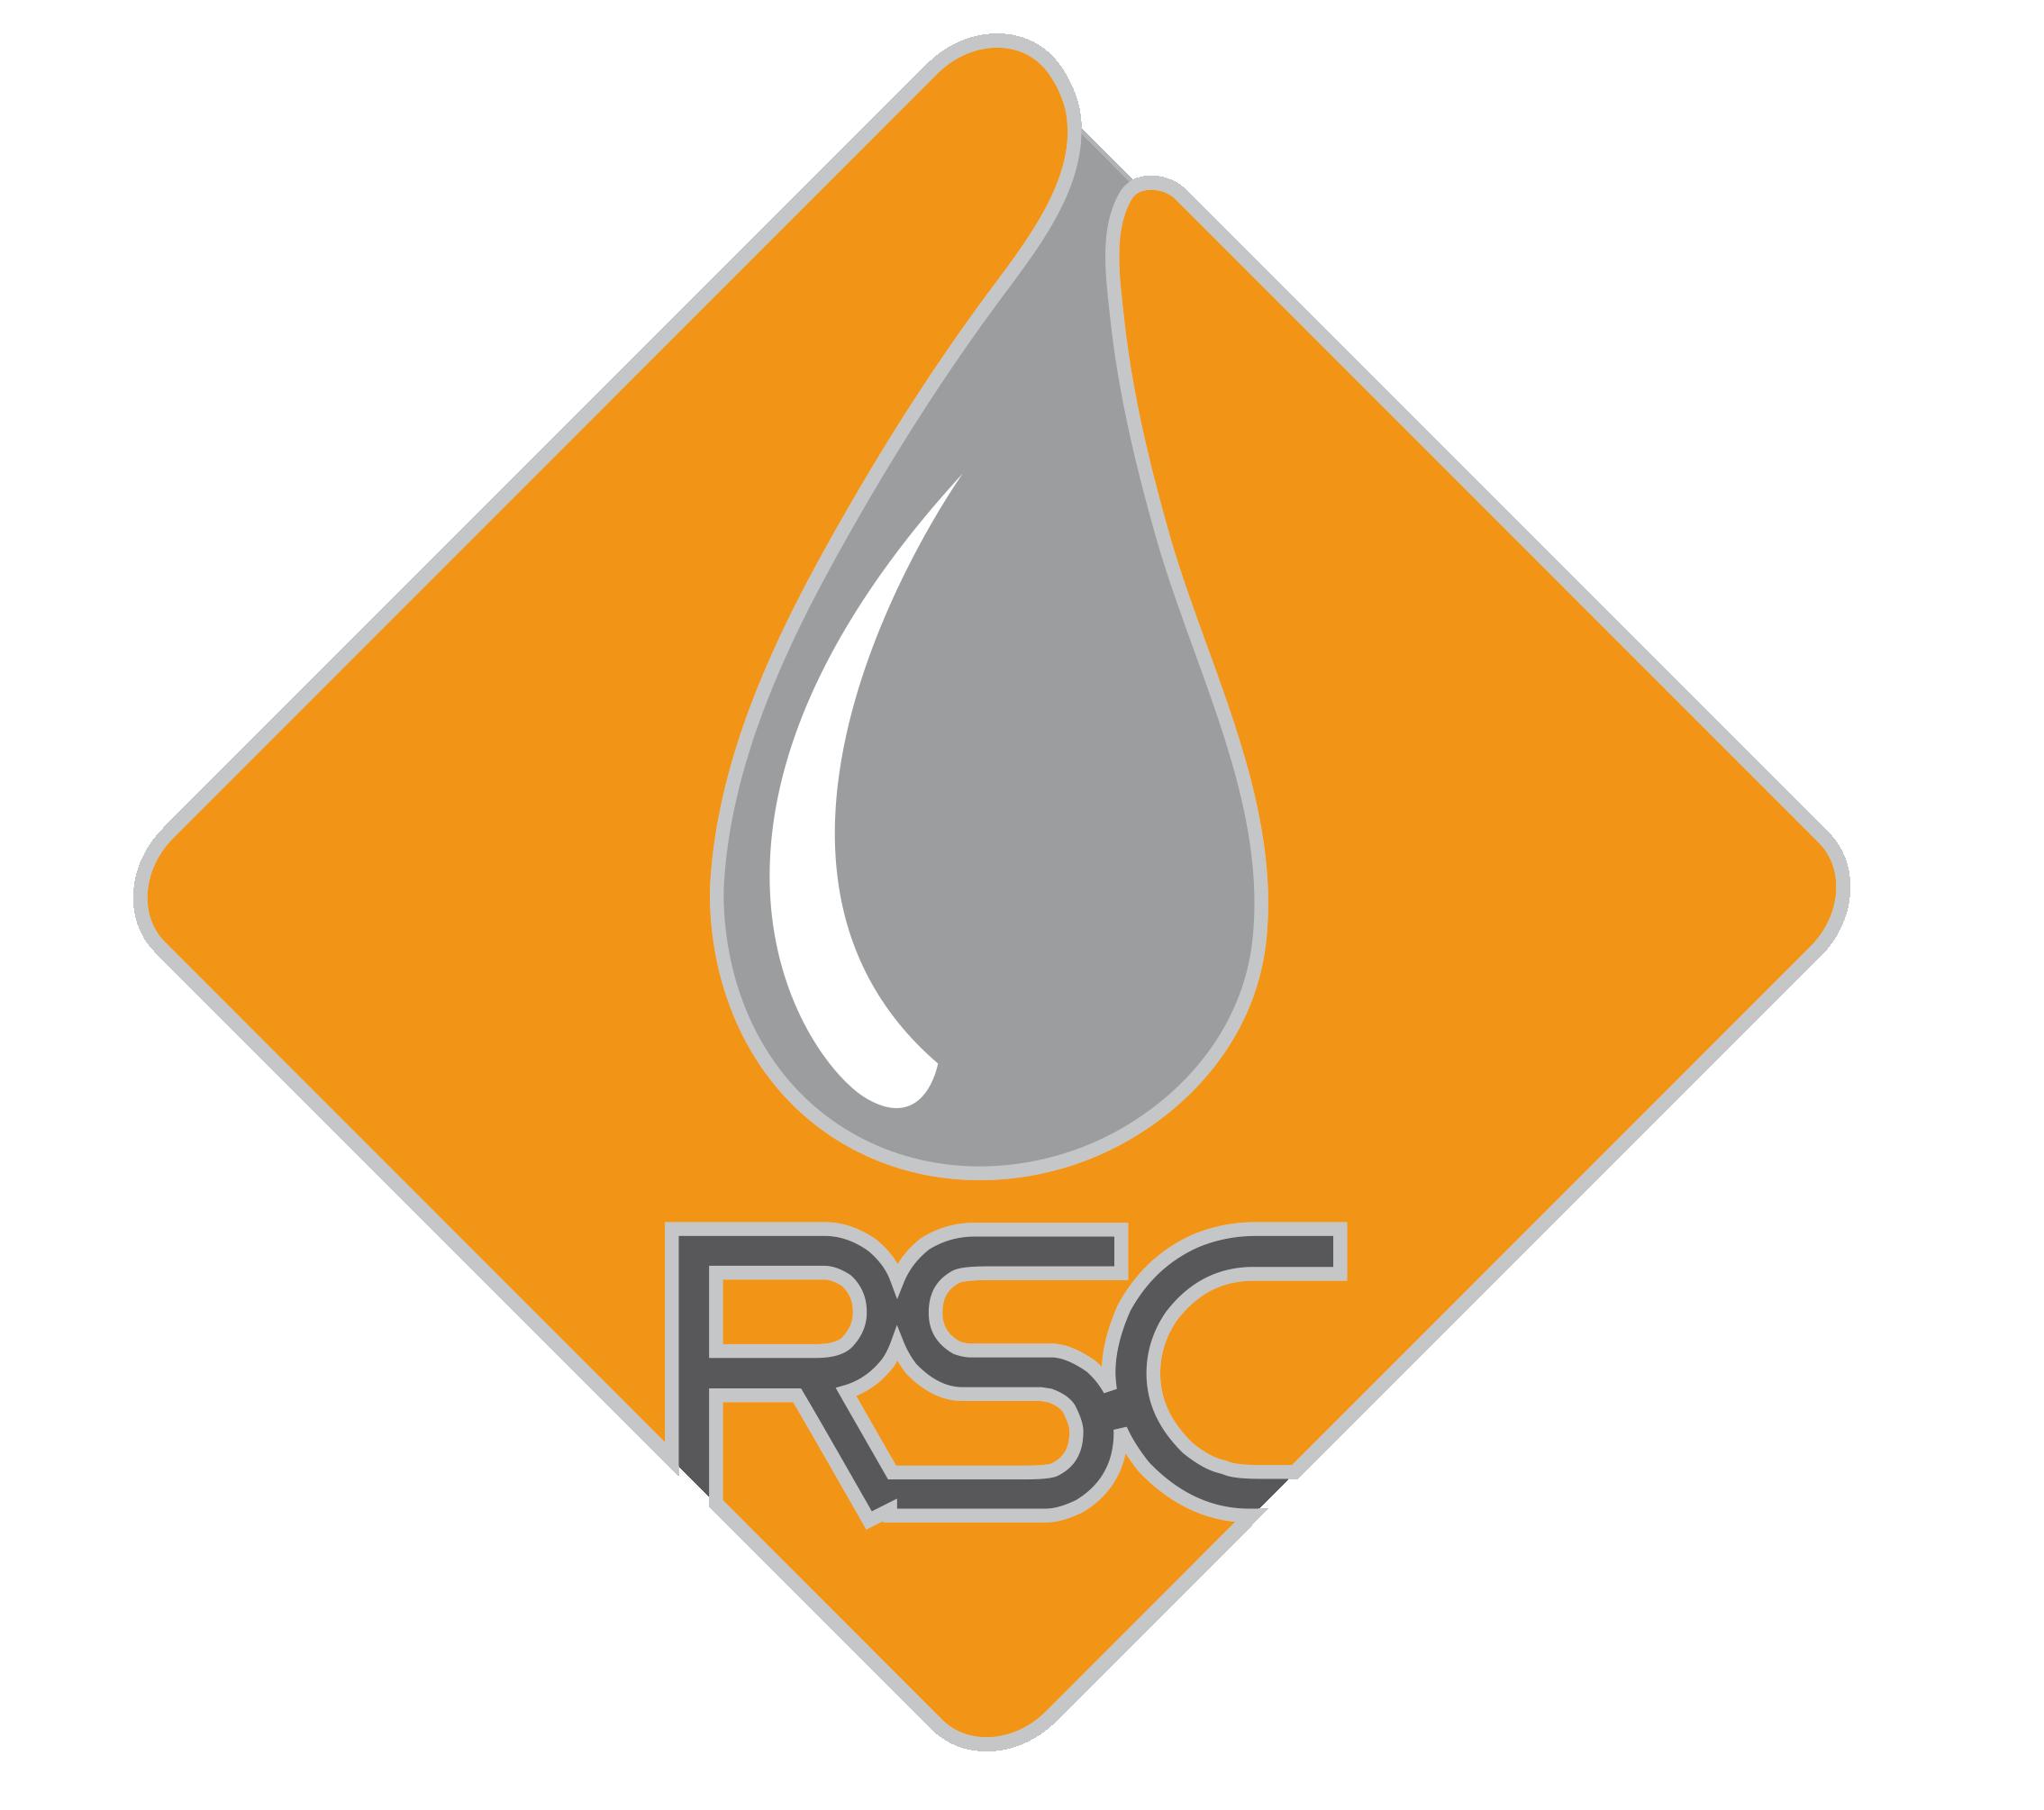 Logo RSC